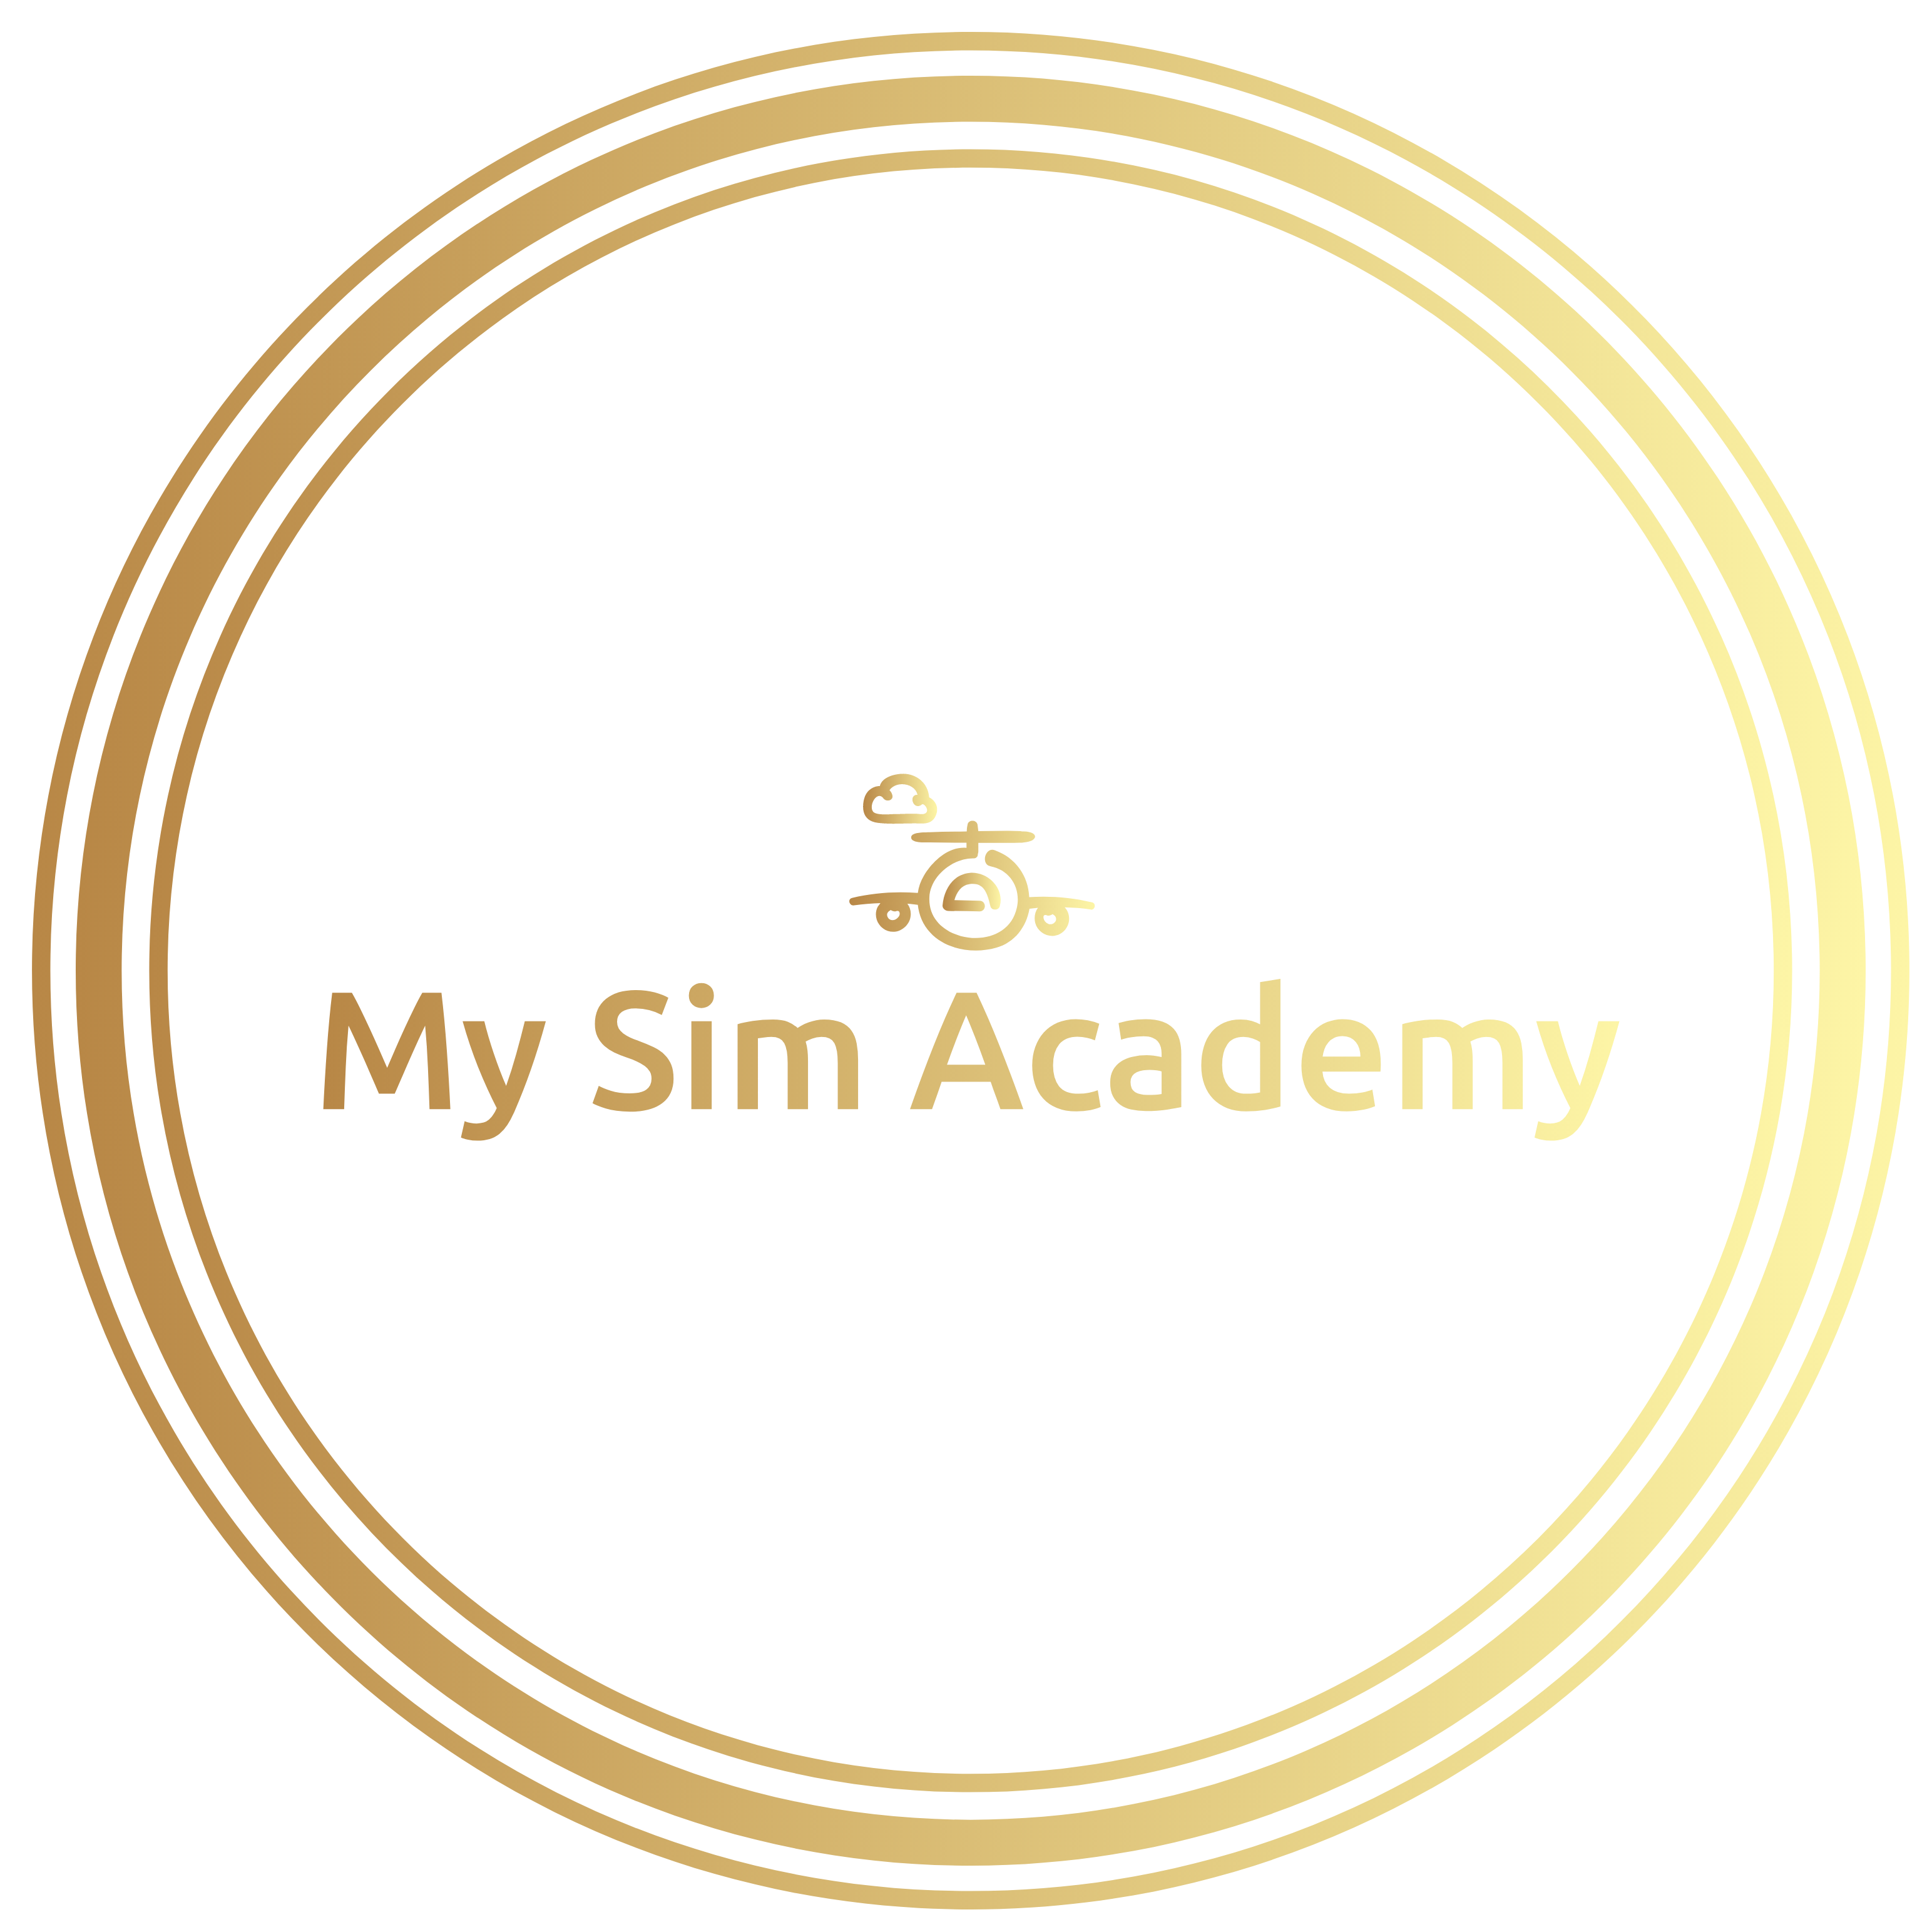 My Sim Academy